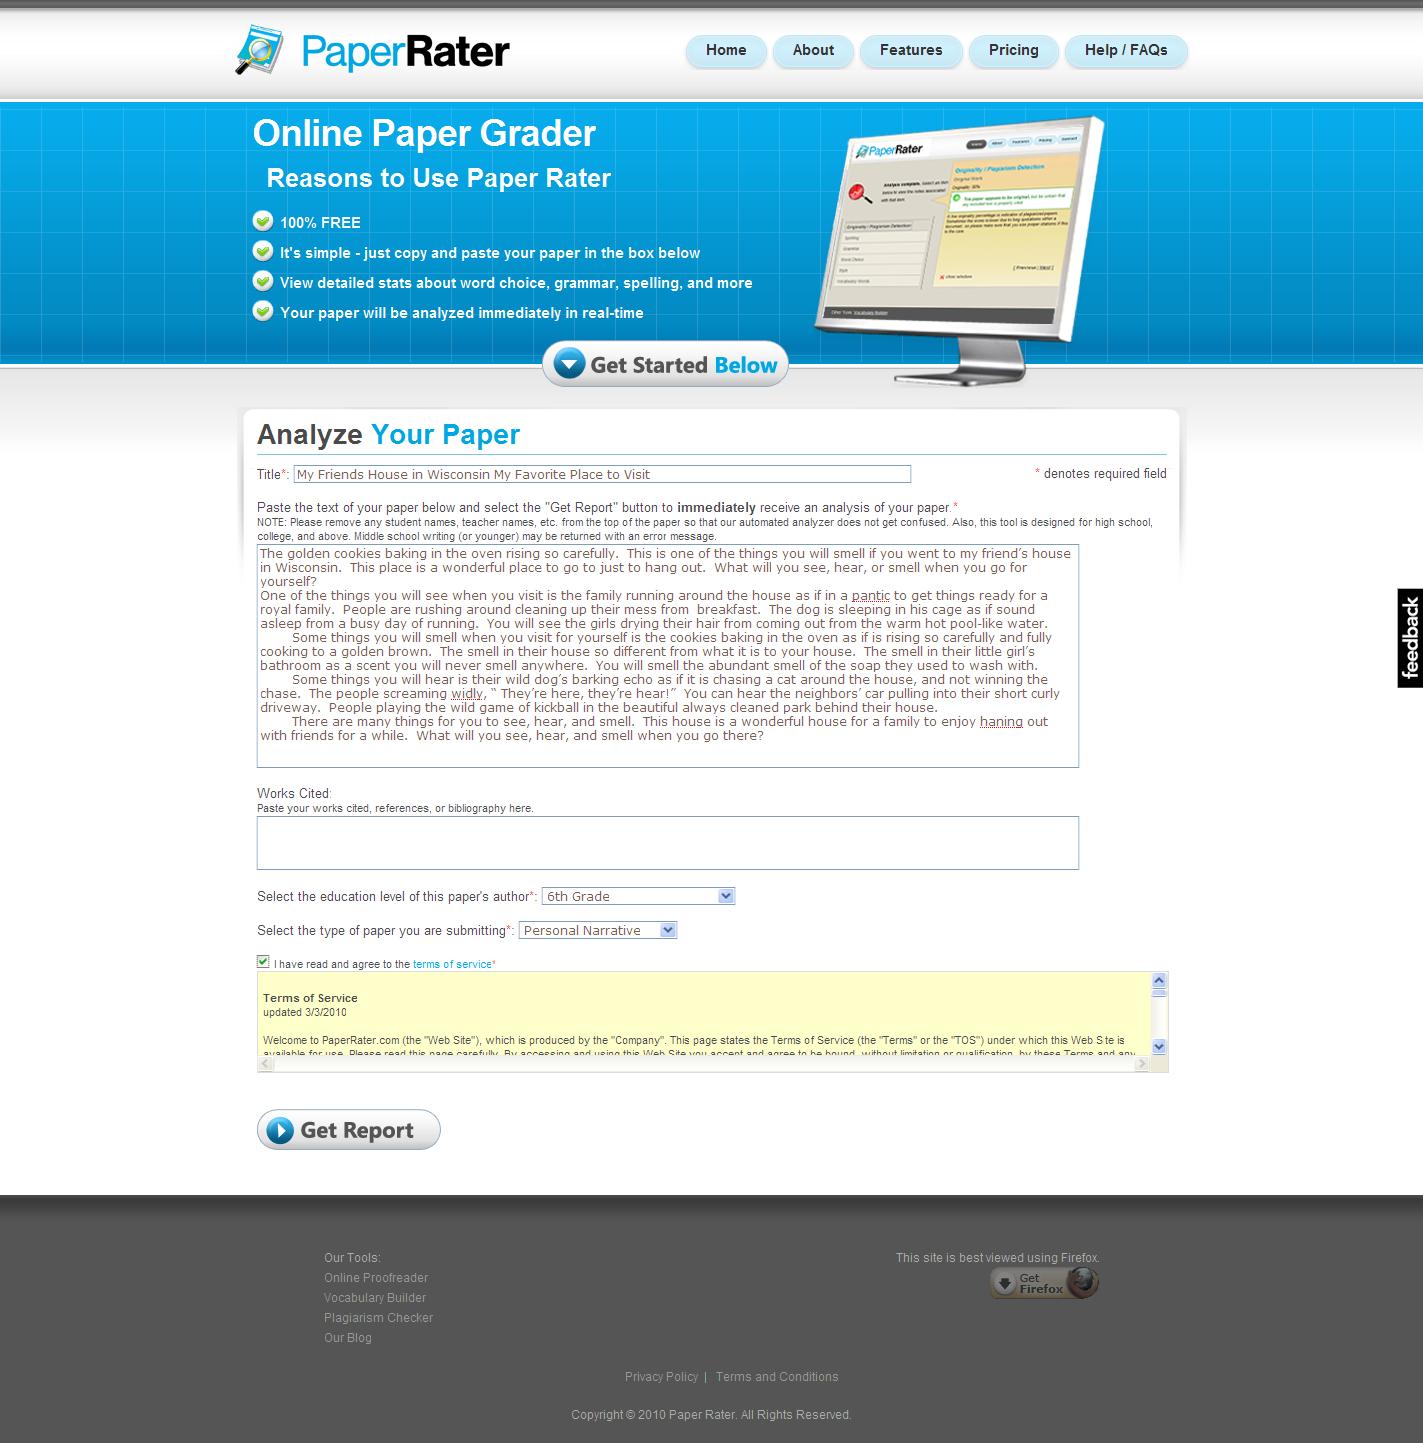 007 Essay Checker Free Online Example Amazing Sentence Grammar Plagiarism Document Full